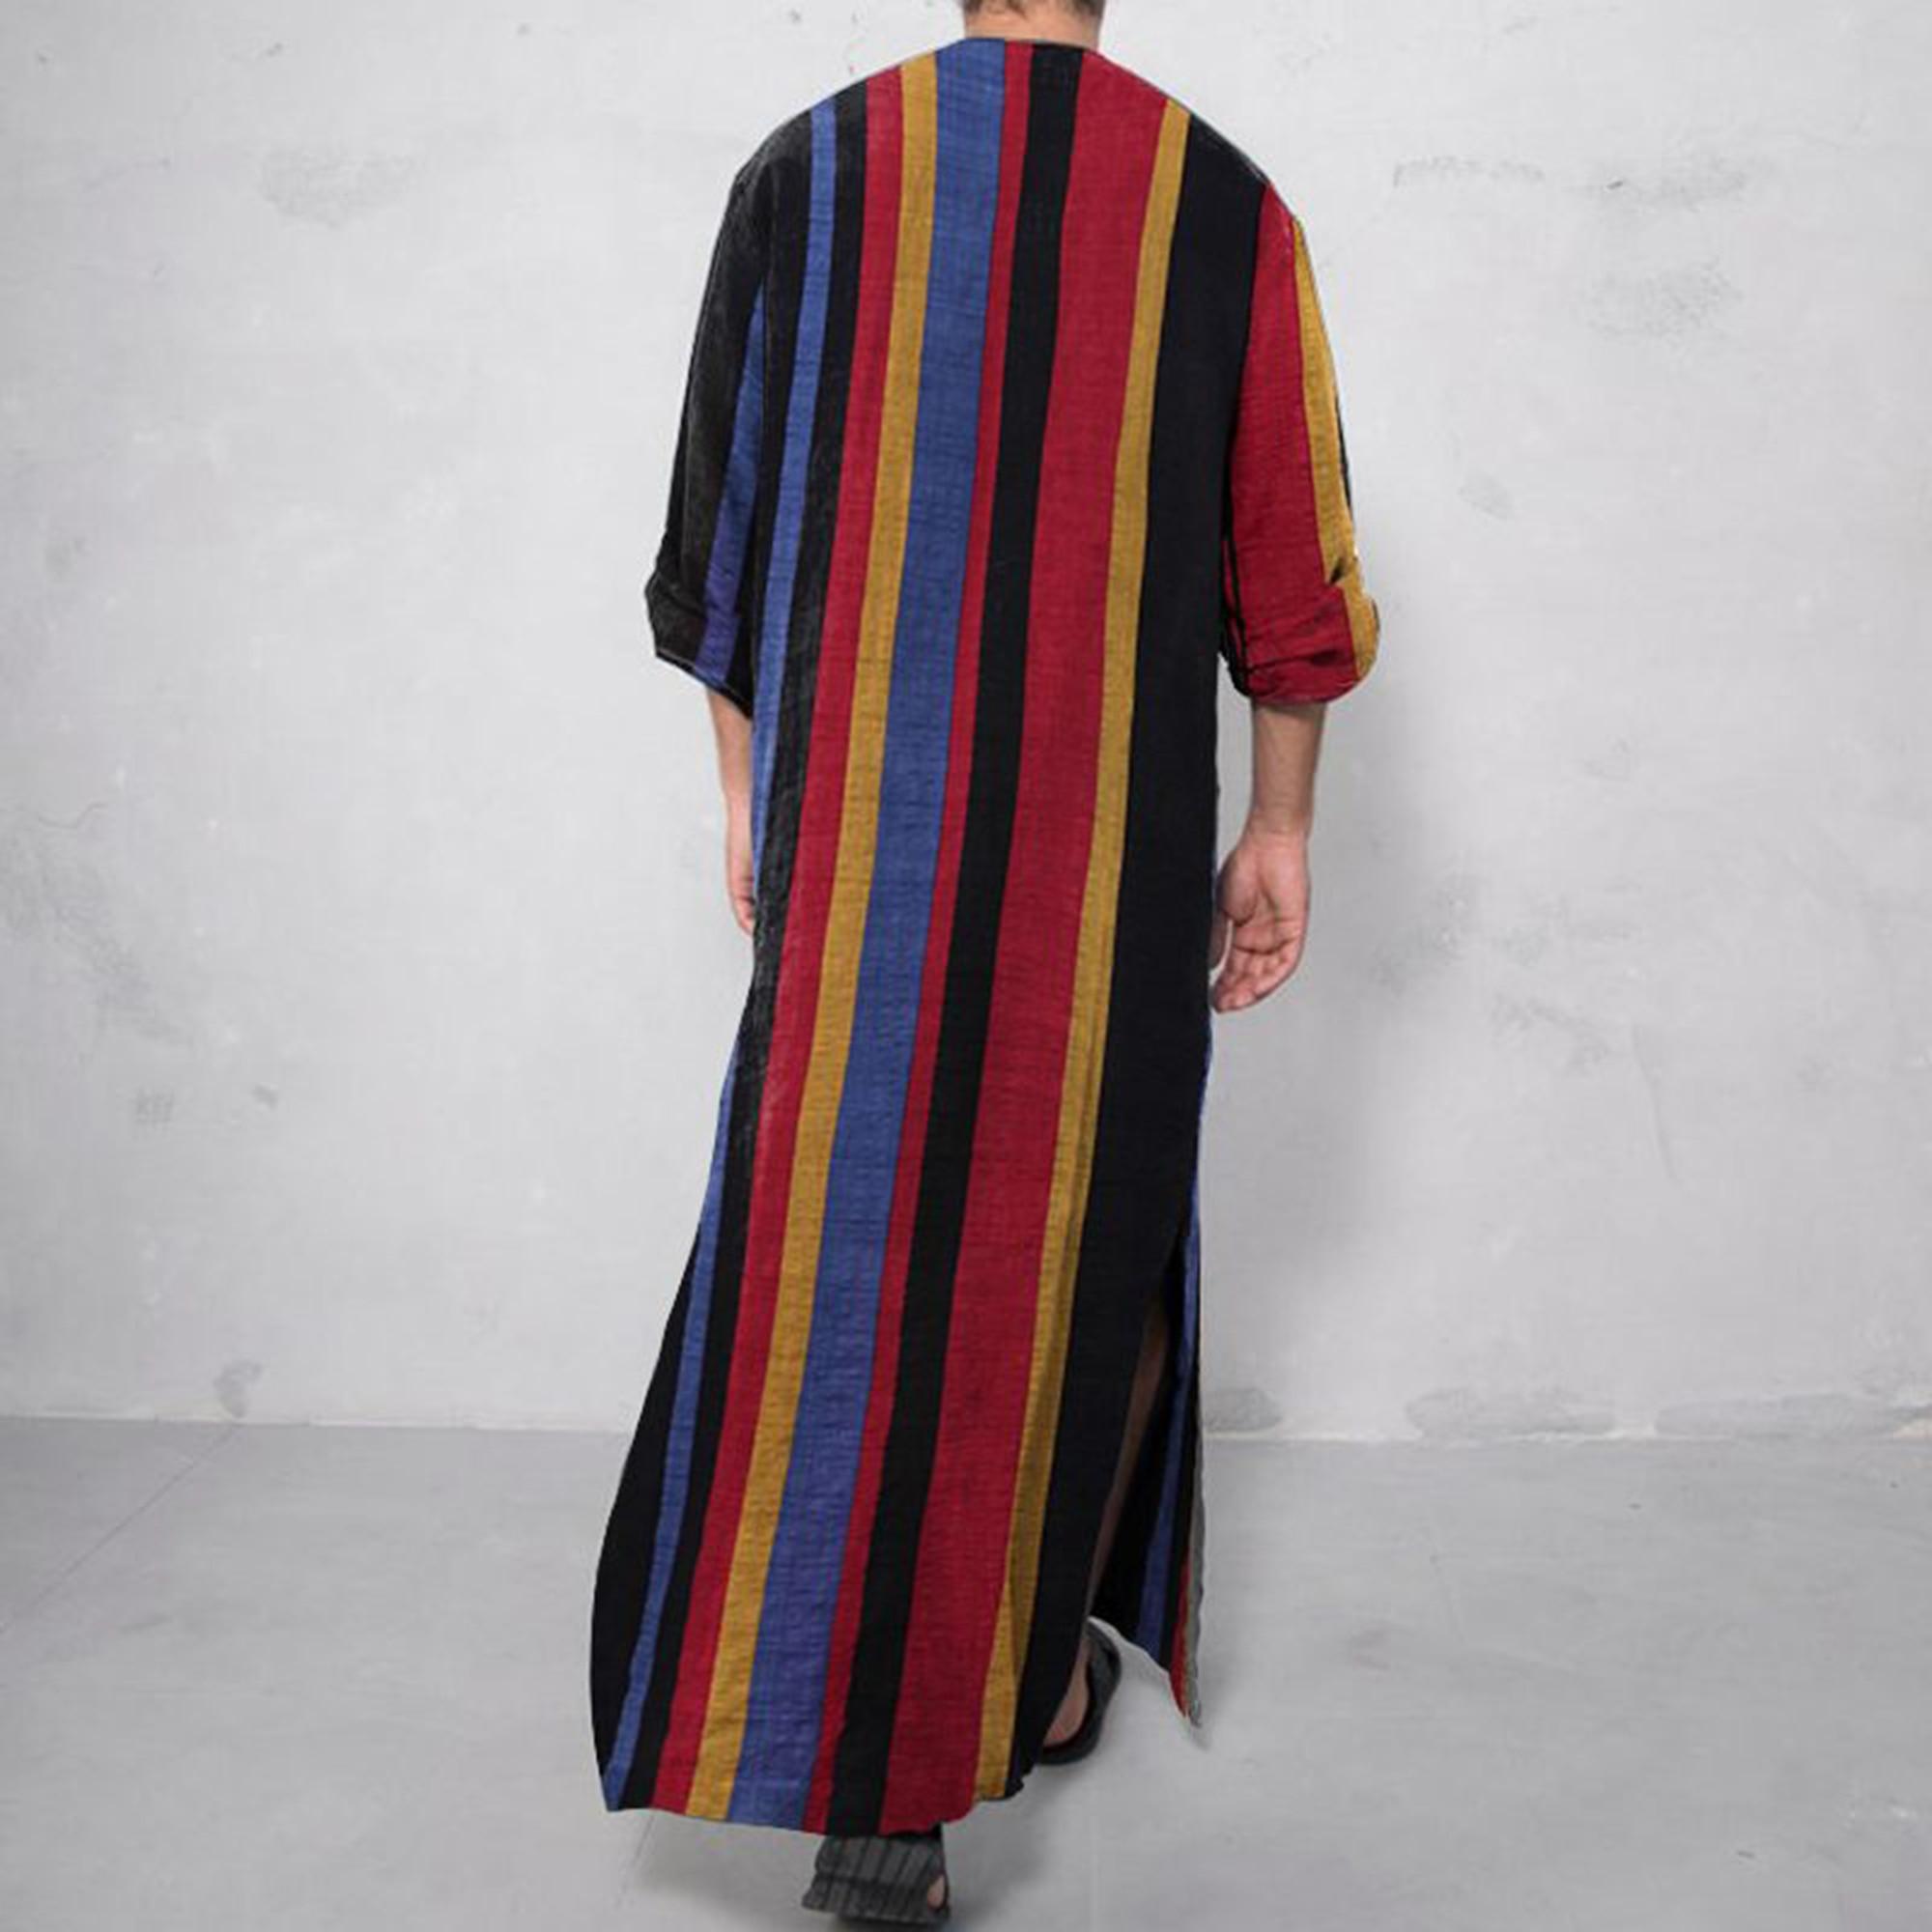 Men's Middle East Muslim Islamic Kaftan Arab Vintage Stripe Long Sleeve Men Robe Loose Dubai Kaftan Male Clothing Oversize S-4XL